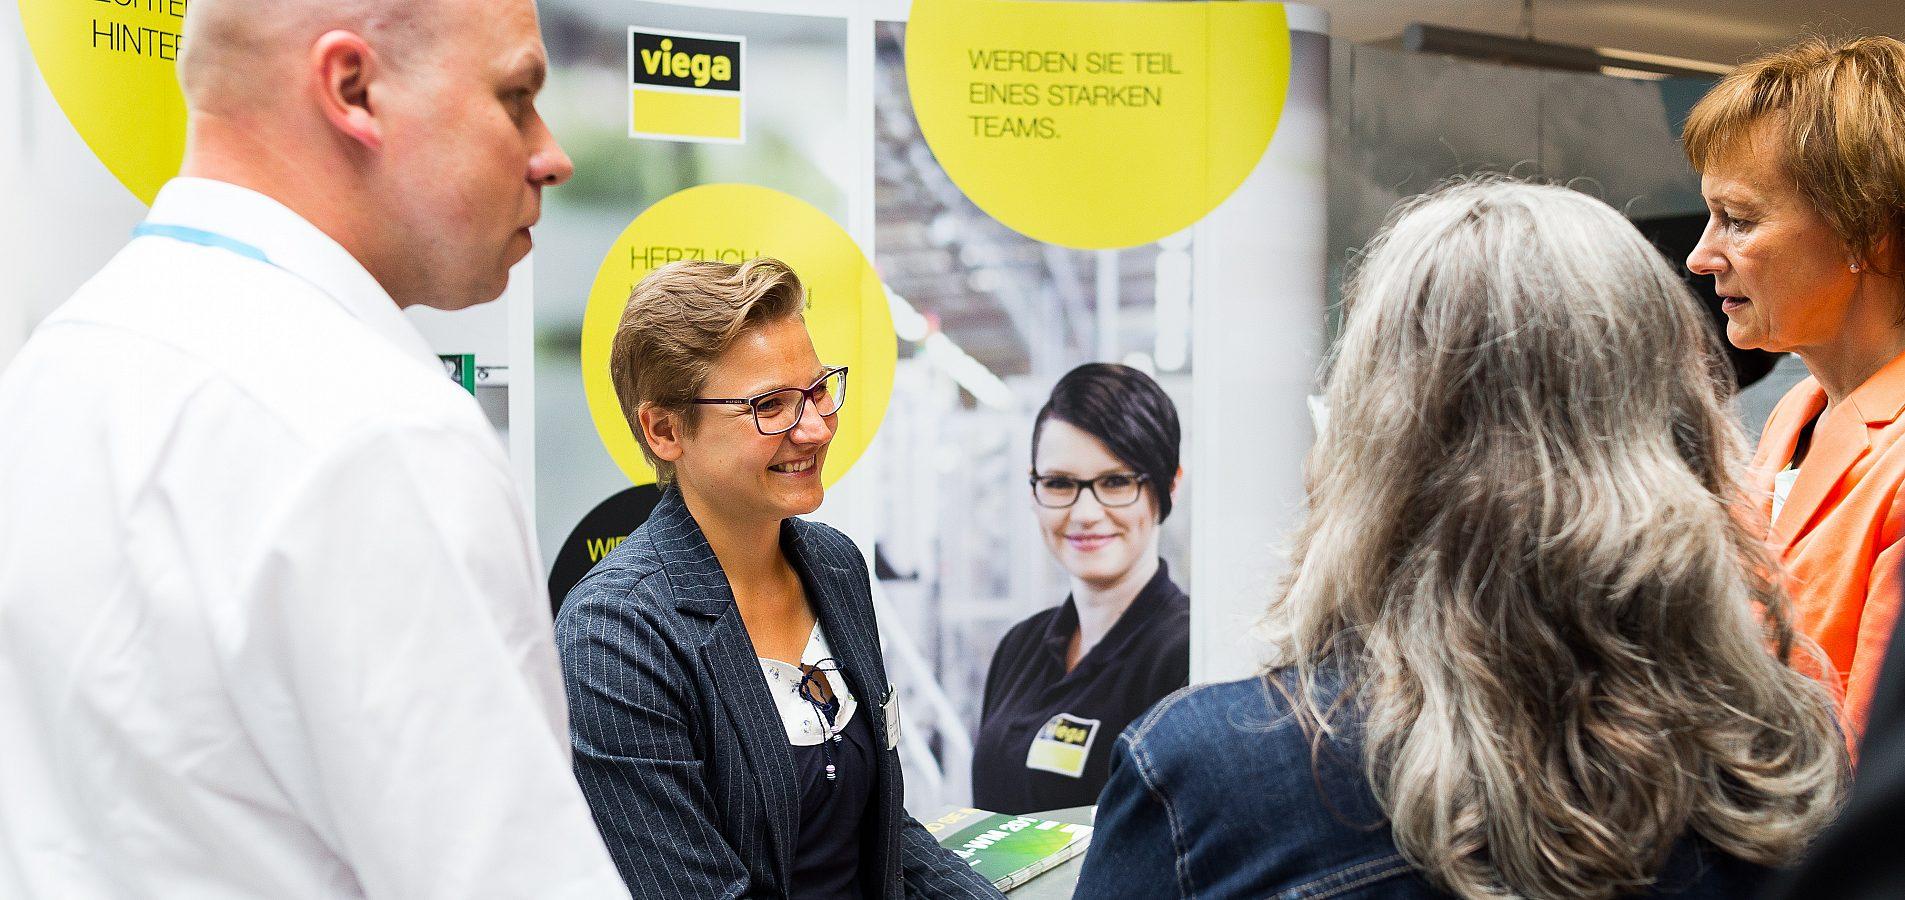 Jobmesse comeback 2018 Copyright: LEG Thüringen/Thomas Abé